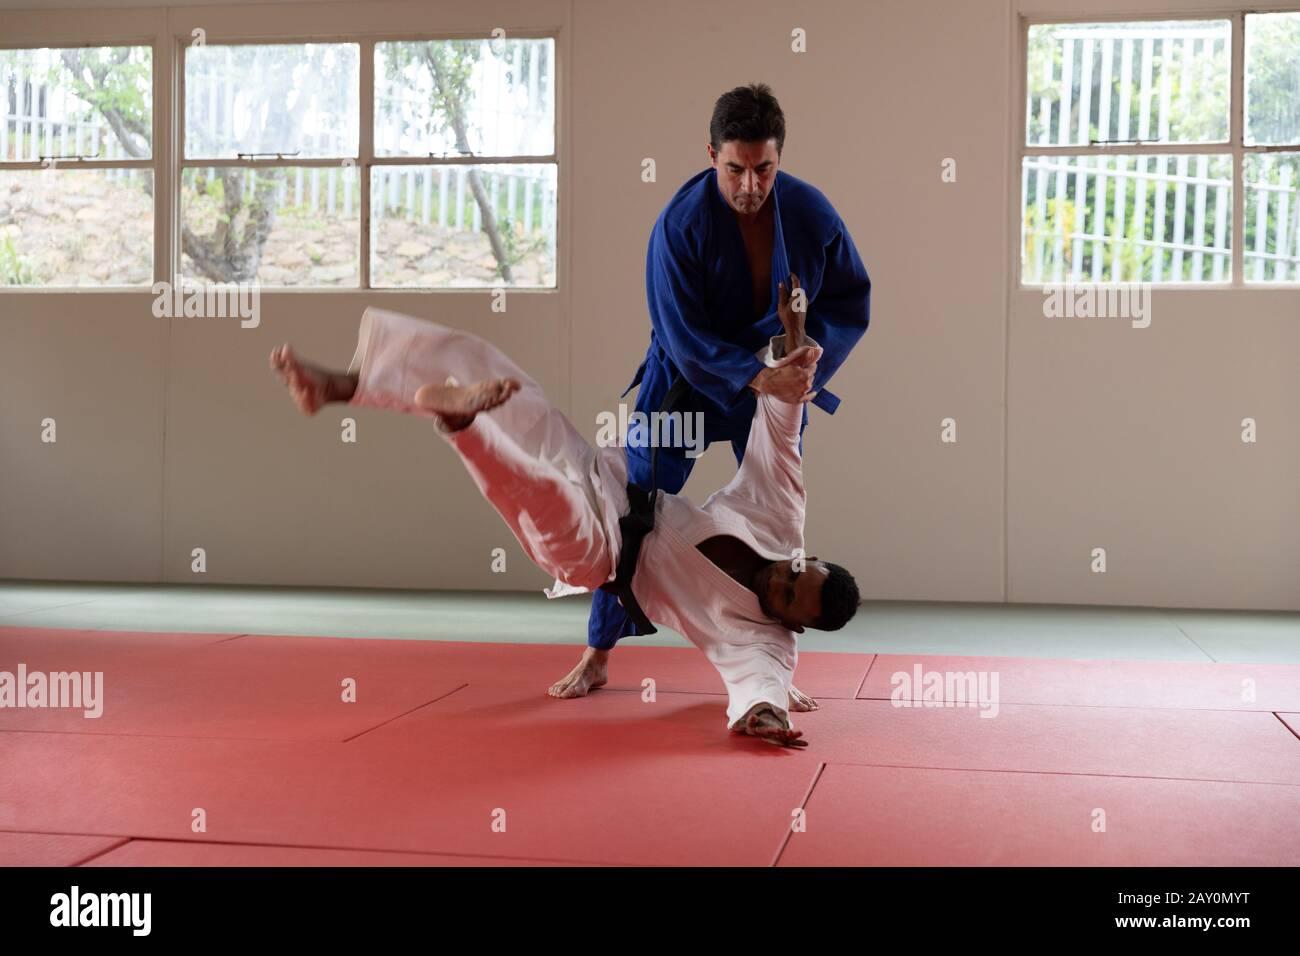 Judokas training in a gym Stock Photo